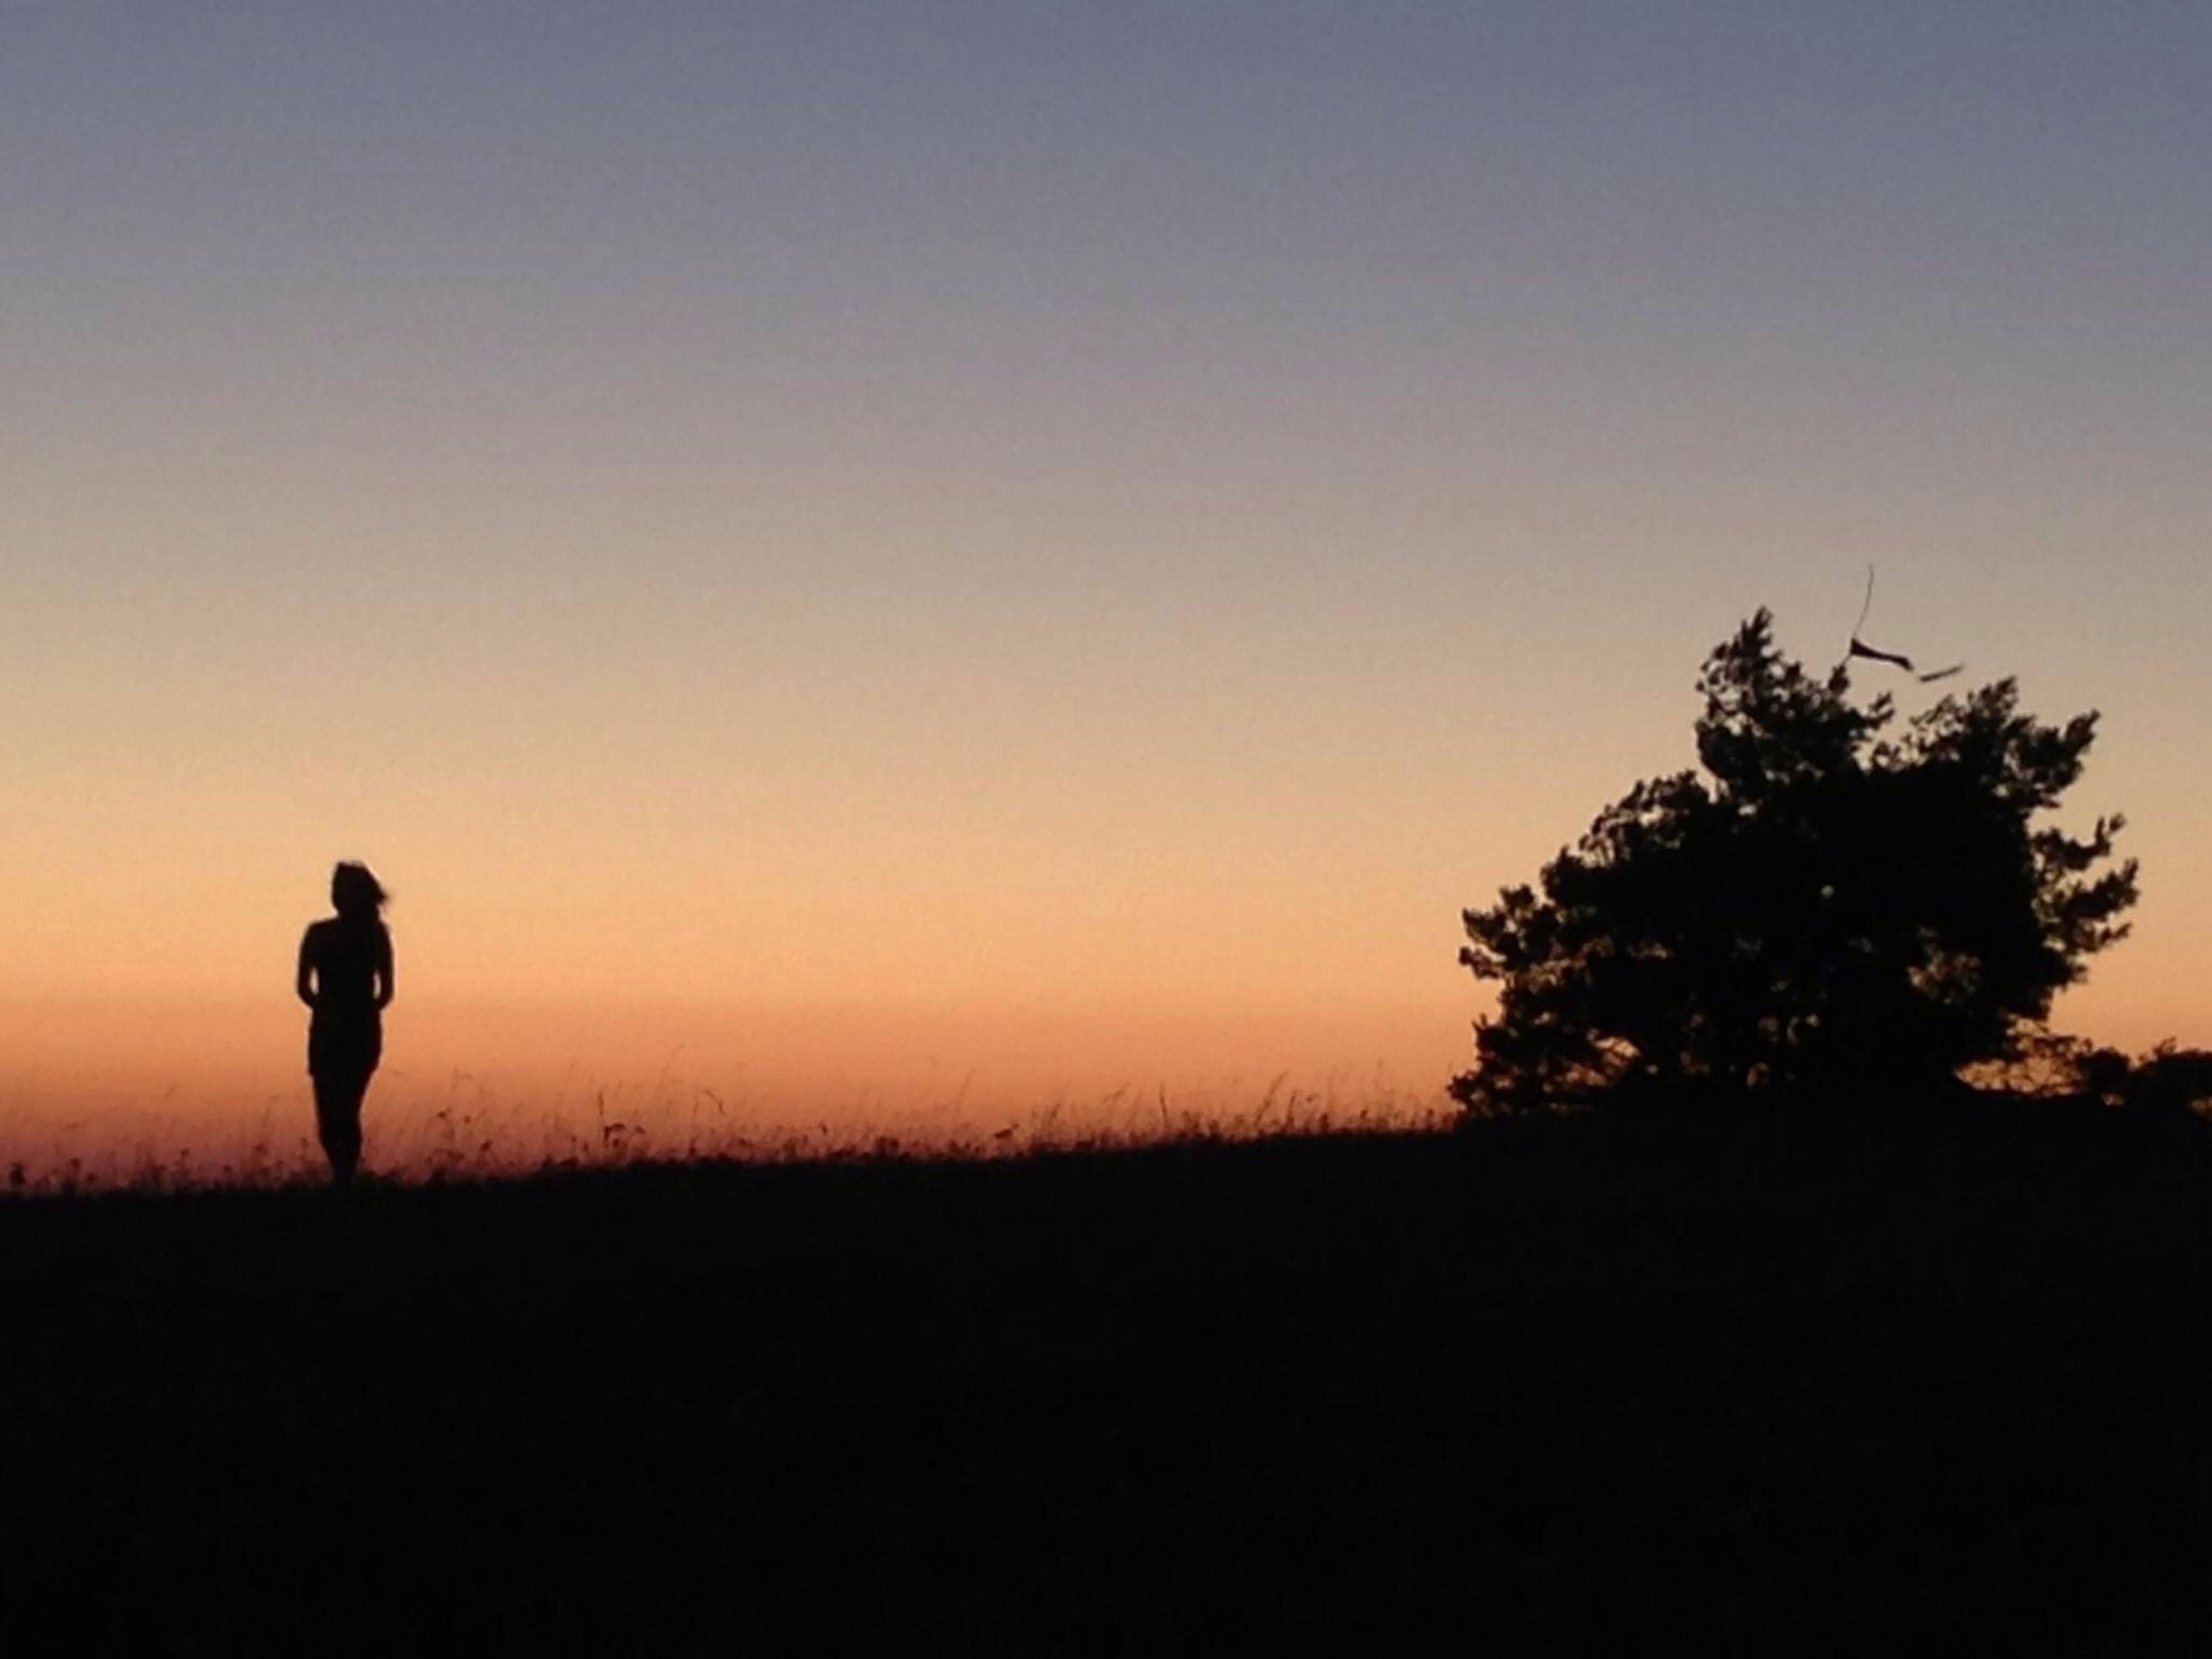 Landscape Sunset Silhouette That's Me ☀️?